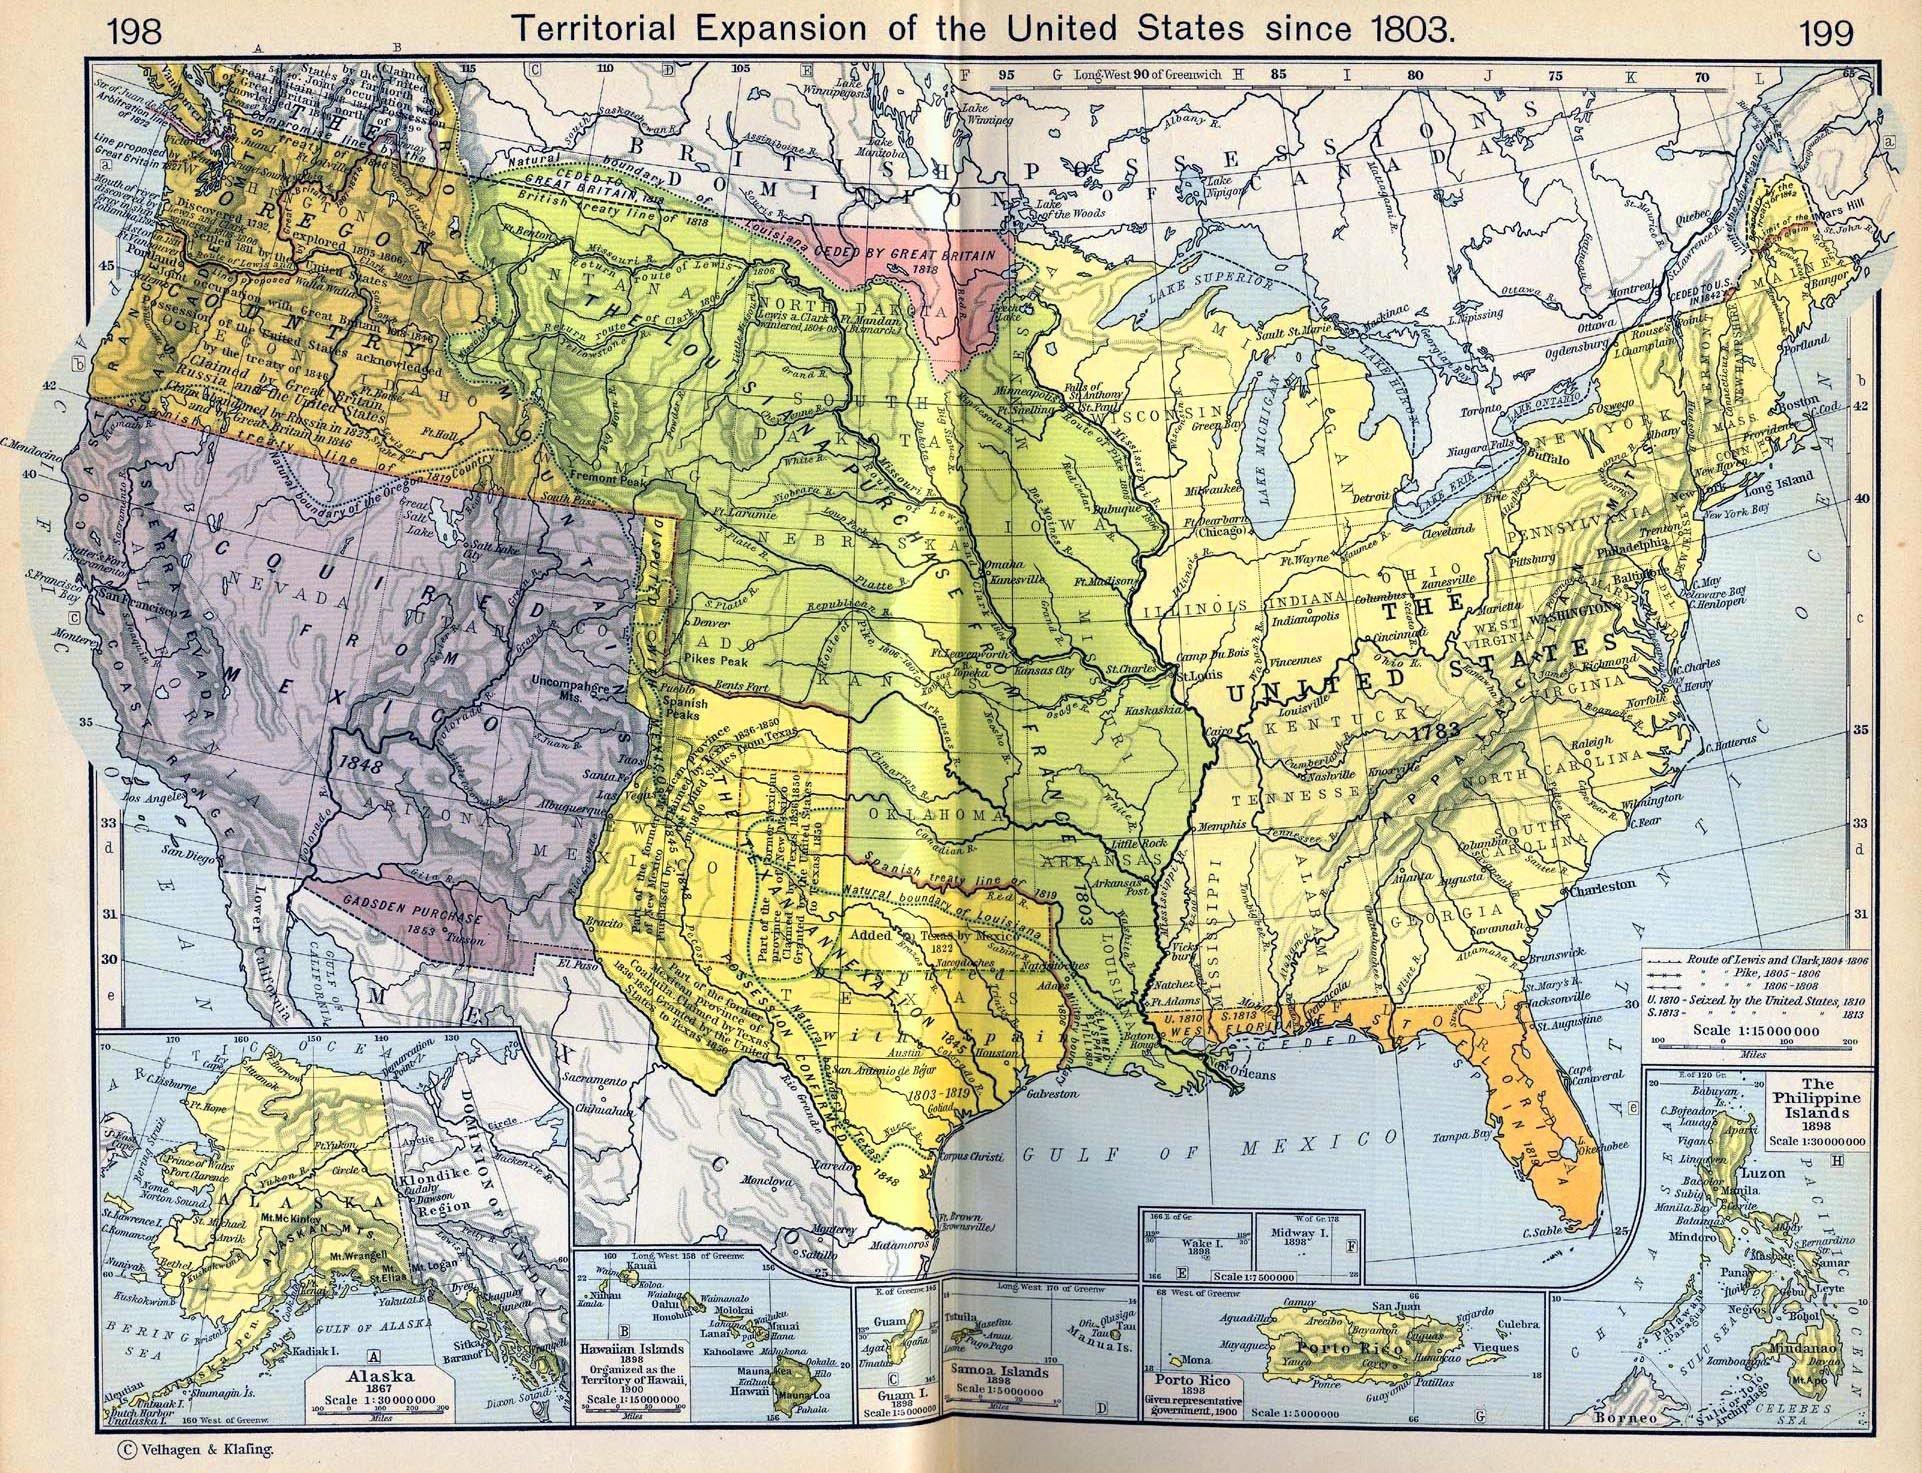 Louisiana Purchase Map Activity Worksheet  Briefencounters Within Louisiana Purchase Map Activity Worksheet